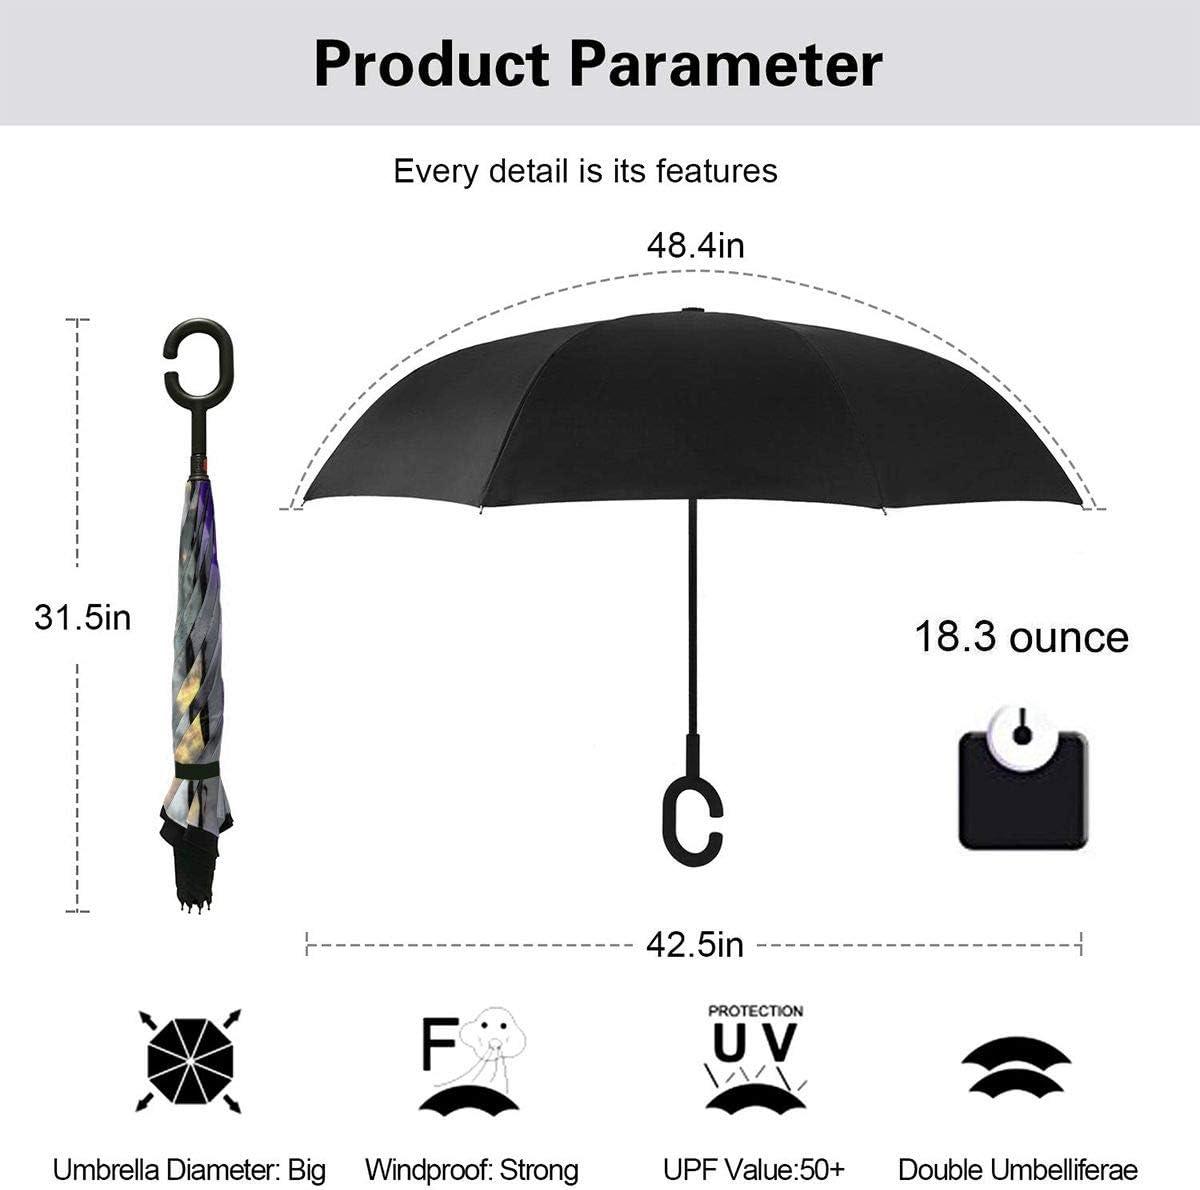 Double Layer Hawaii State Inverted Umbrellas Windproof Reverse Folding Umbrella for Car C-Shaped Handle Umbrella